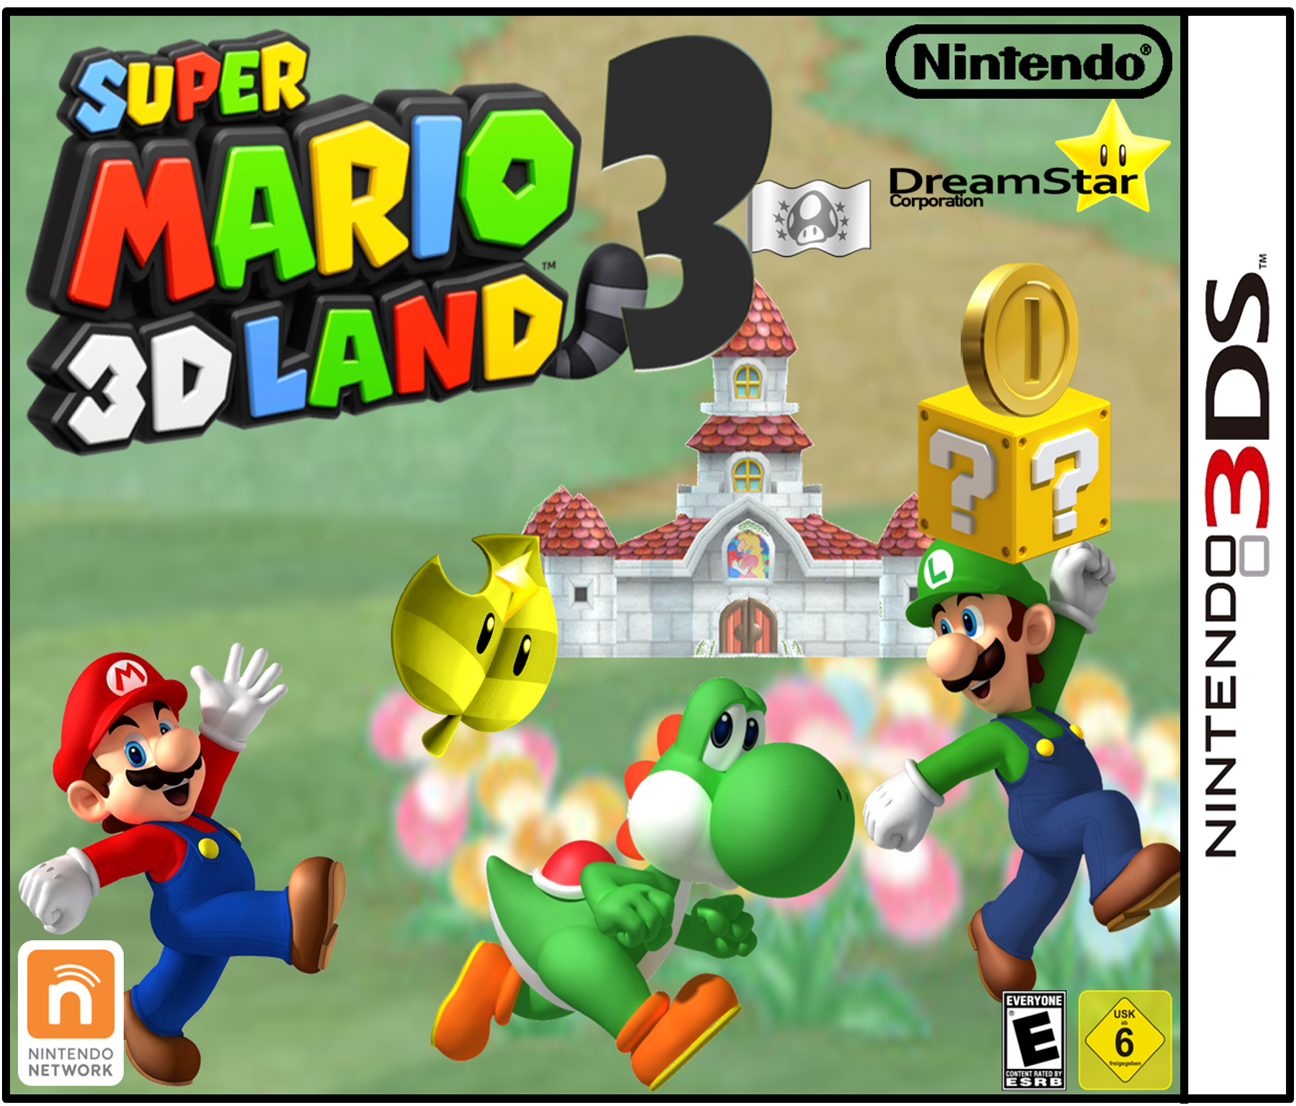 Super mario 3d land save slots slot seeding grassland